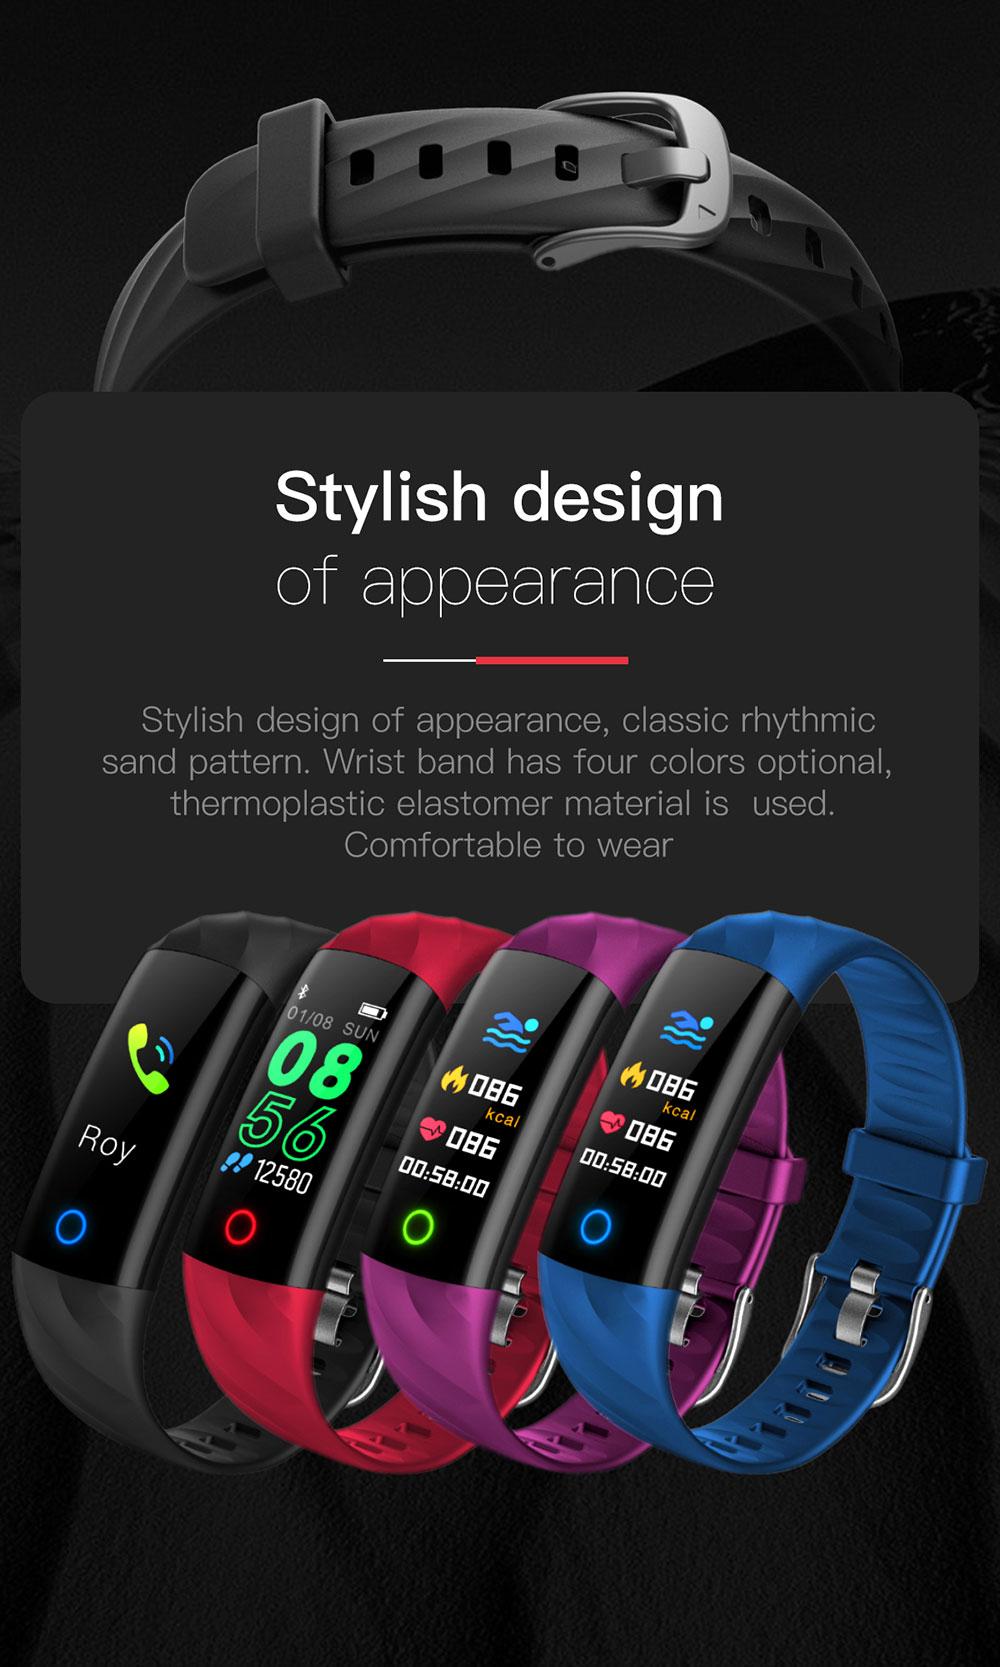 S5-4-130387- Smart bracelet smart band